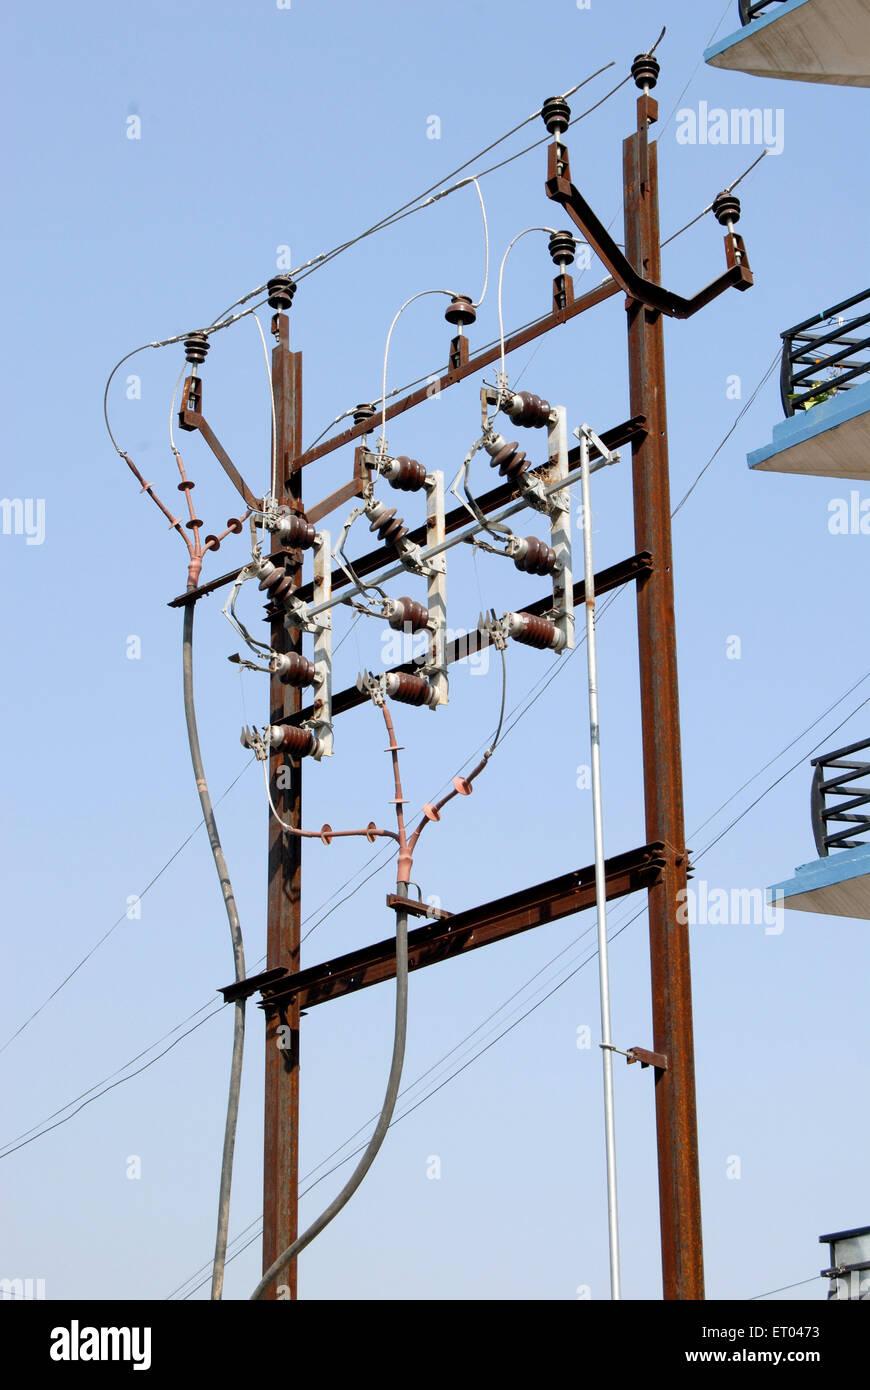 Electric pole ; Jaipur ; Rajasthan ; India November 2008 - Stock Image